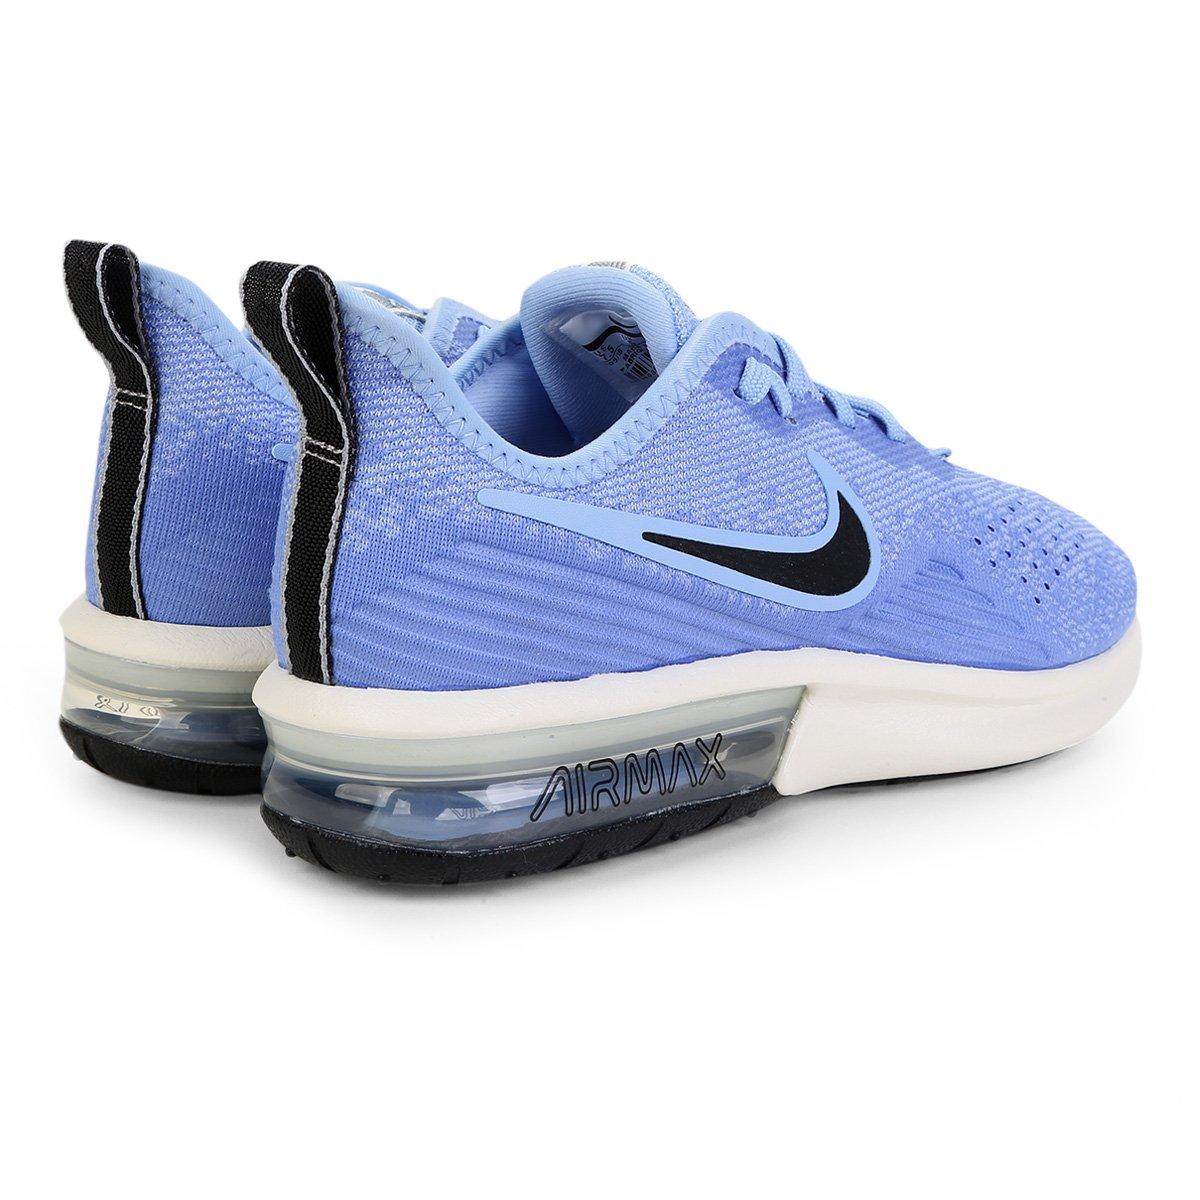 Tênis Nike Air Max Sequent 4 Feminino - Tam: 35 - 2